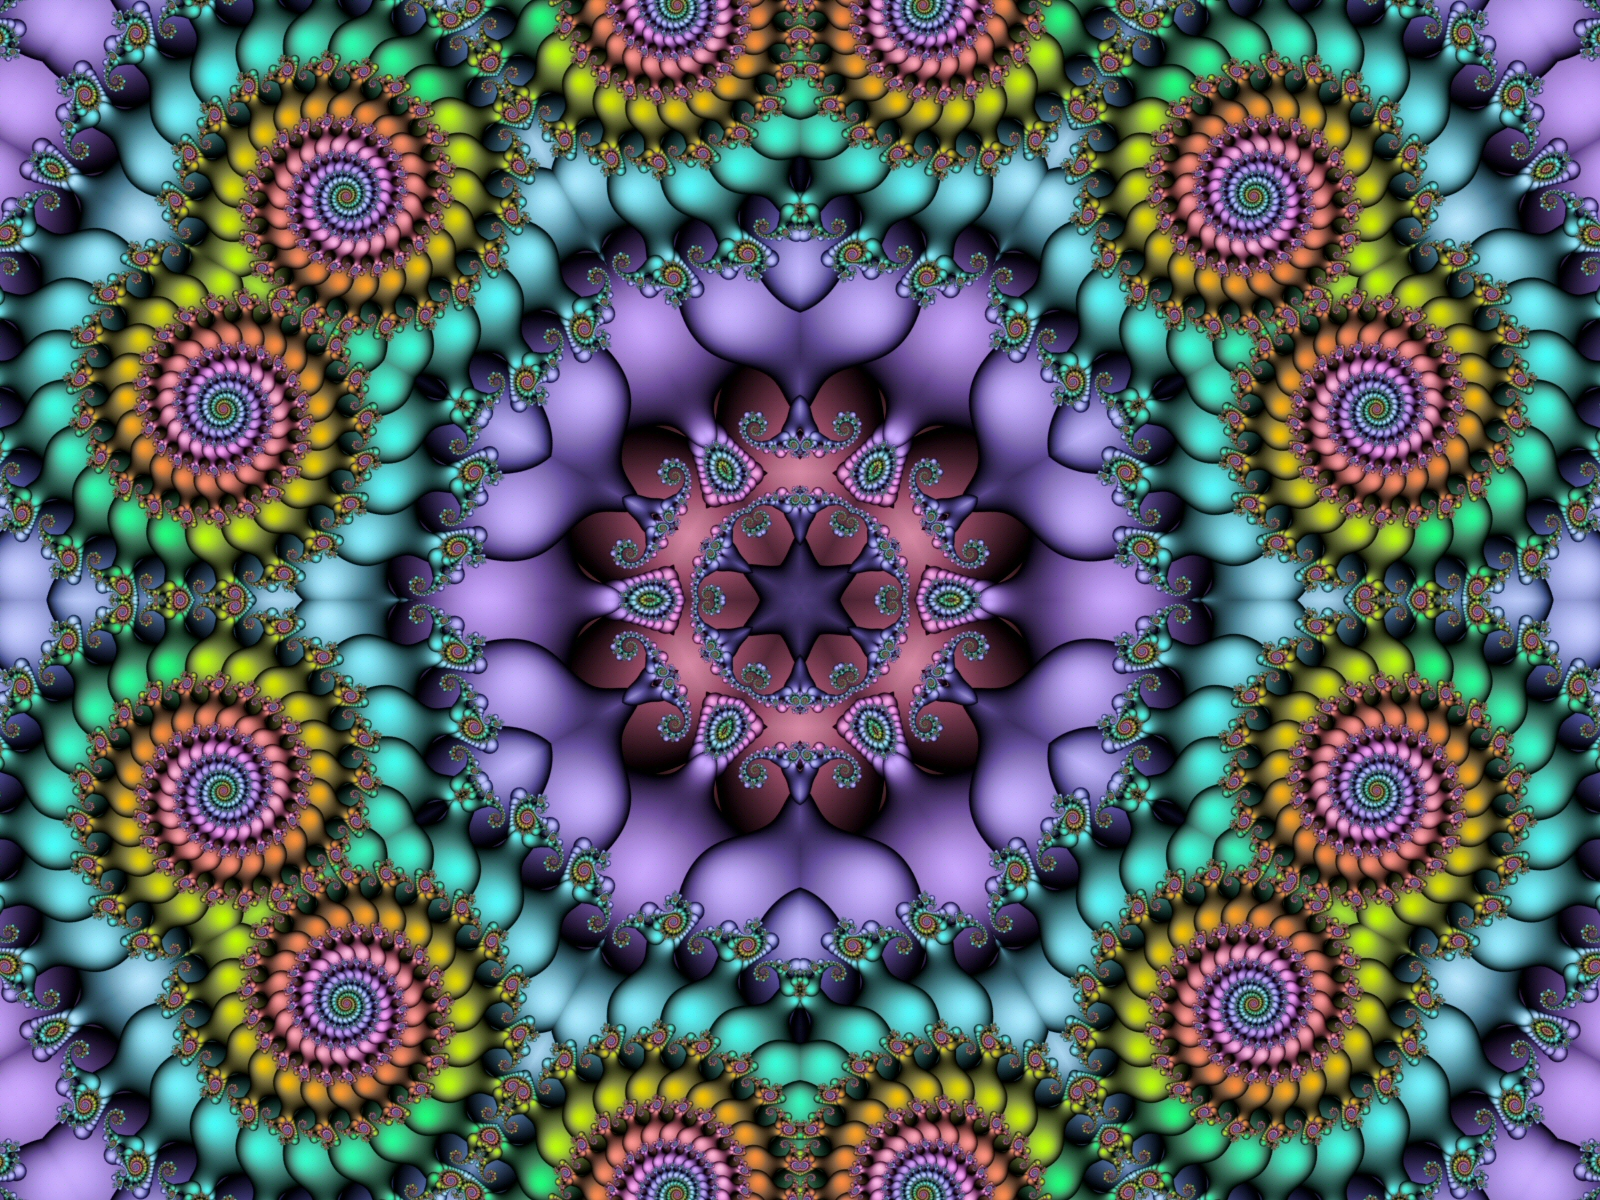 Fun Spirals by Thelma1